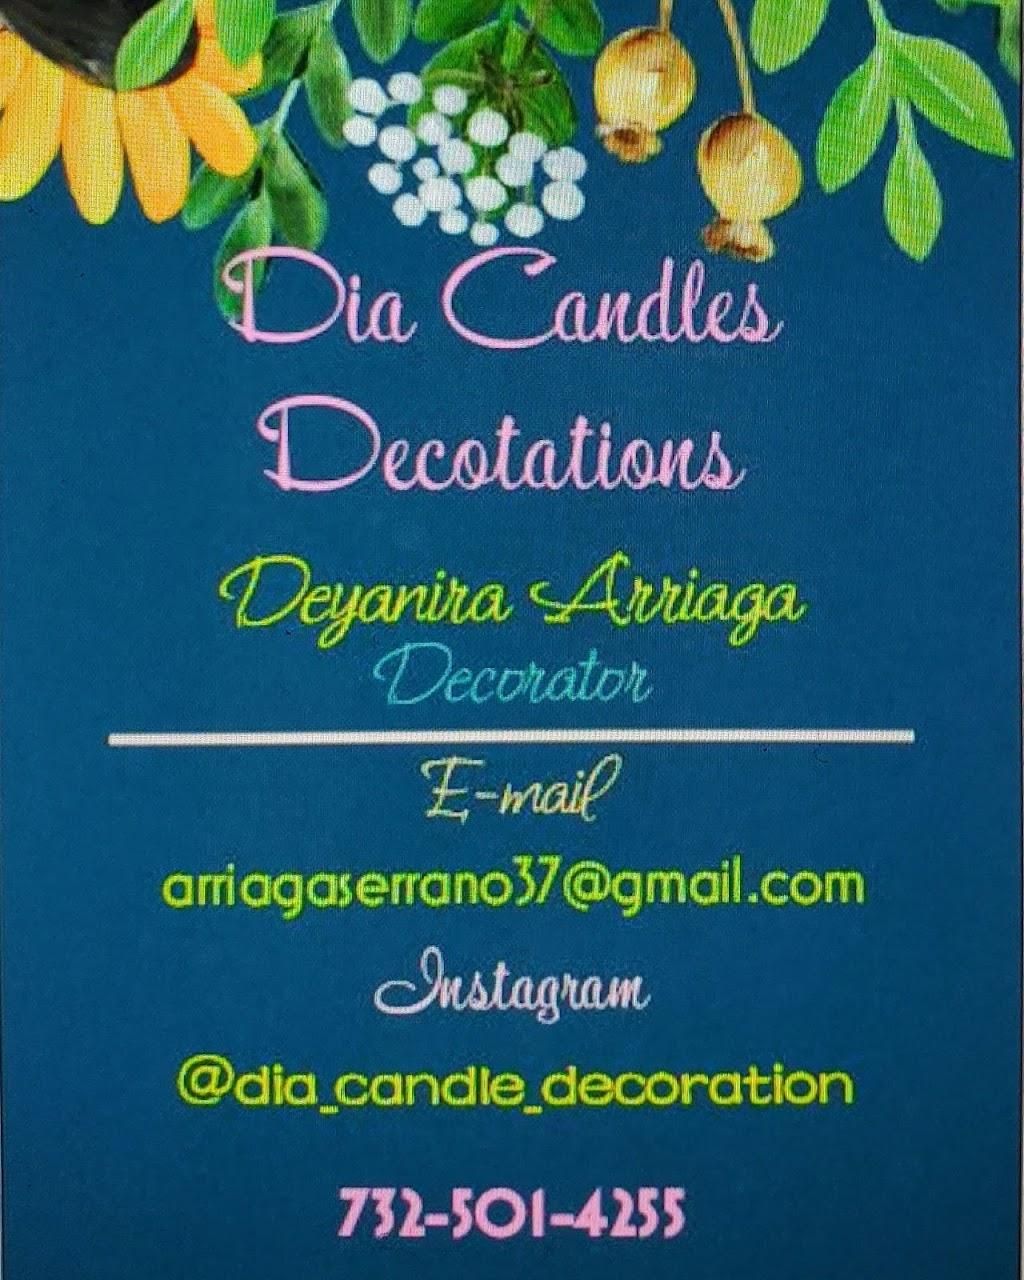 DIa Candles Decorations - art gallery    Photo 2 of 2   Address: Carteret, NJ 07008, USA   Phone: (732) 501-4255